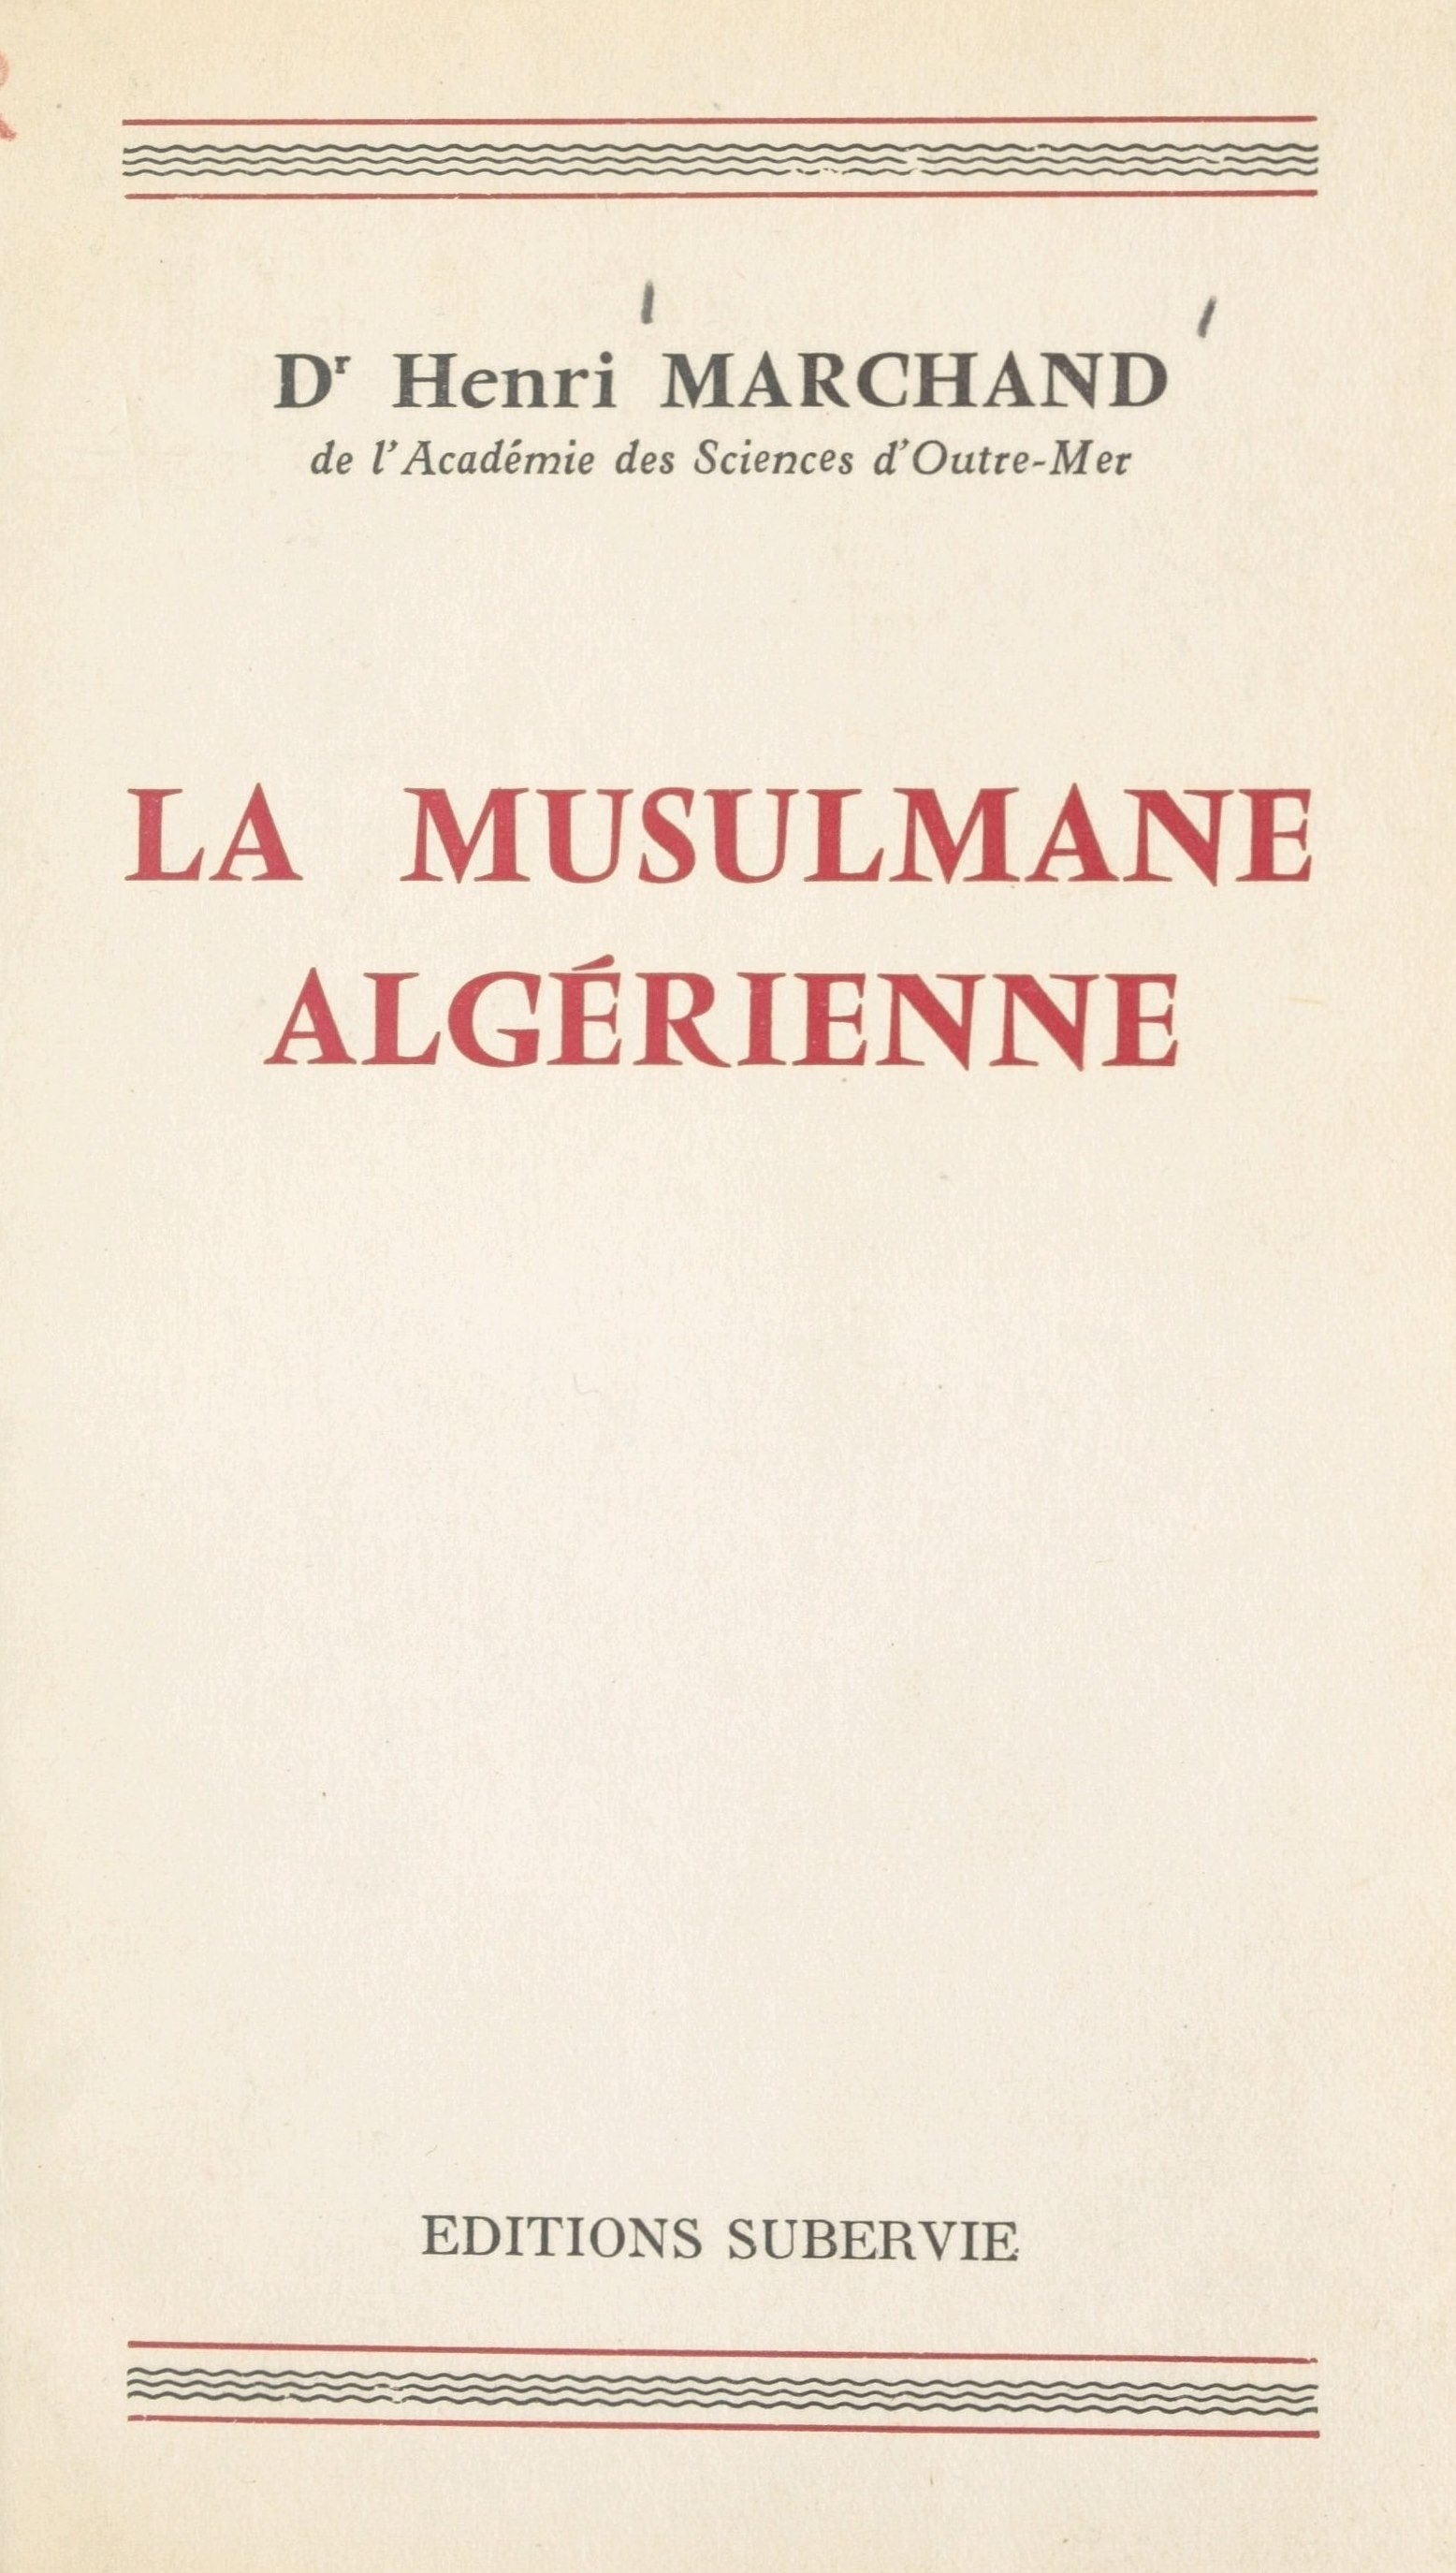 La musulmane algérienne